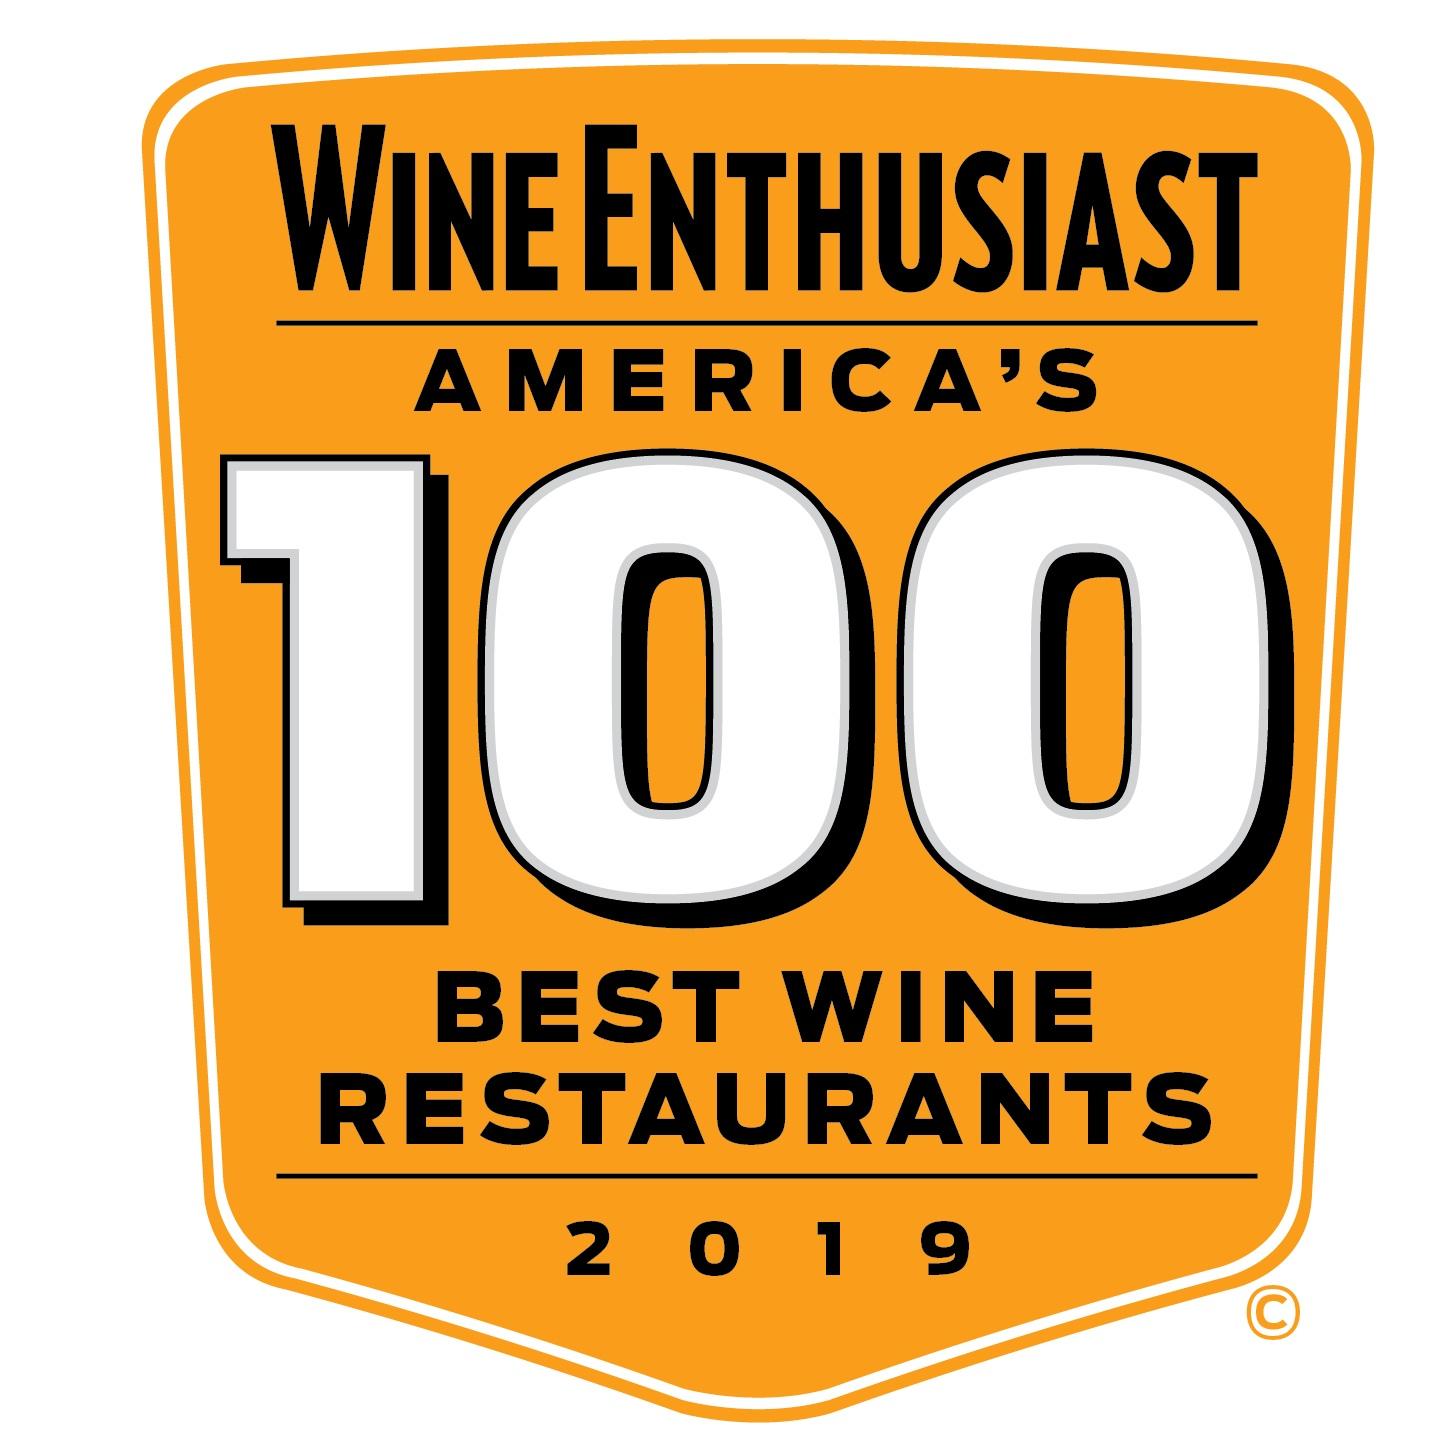 America's Best 100 Wine Restaurants